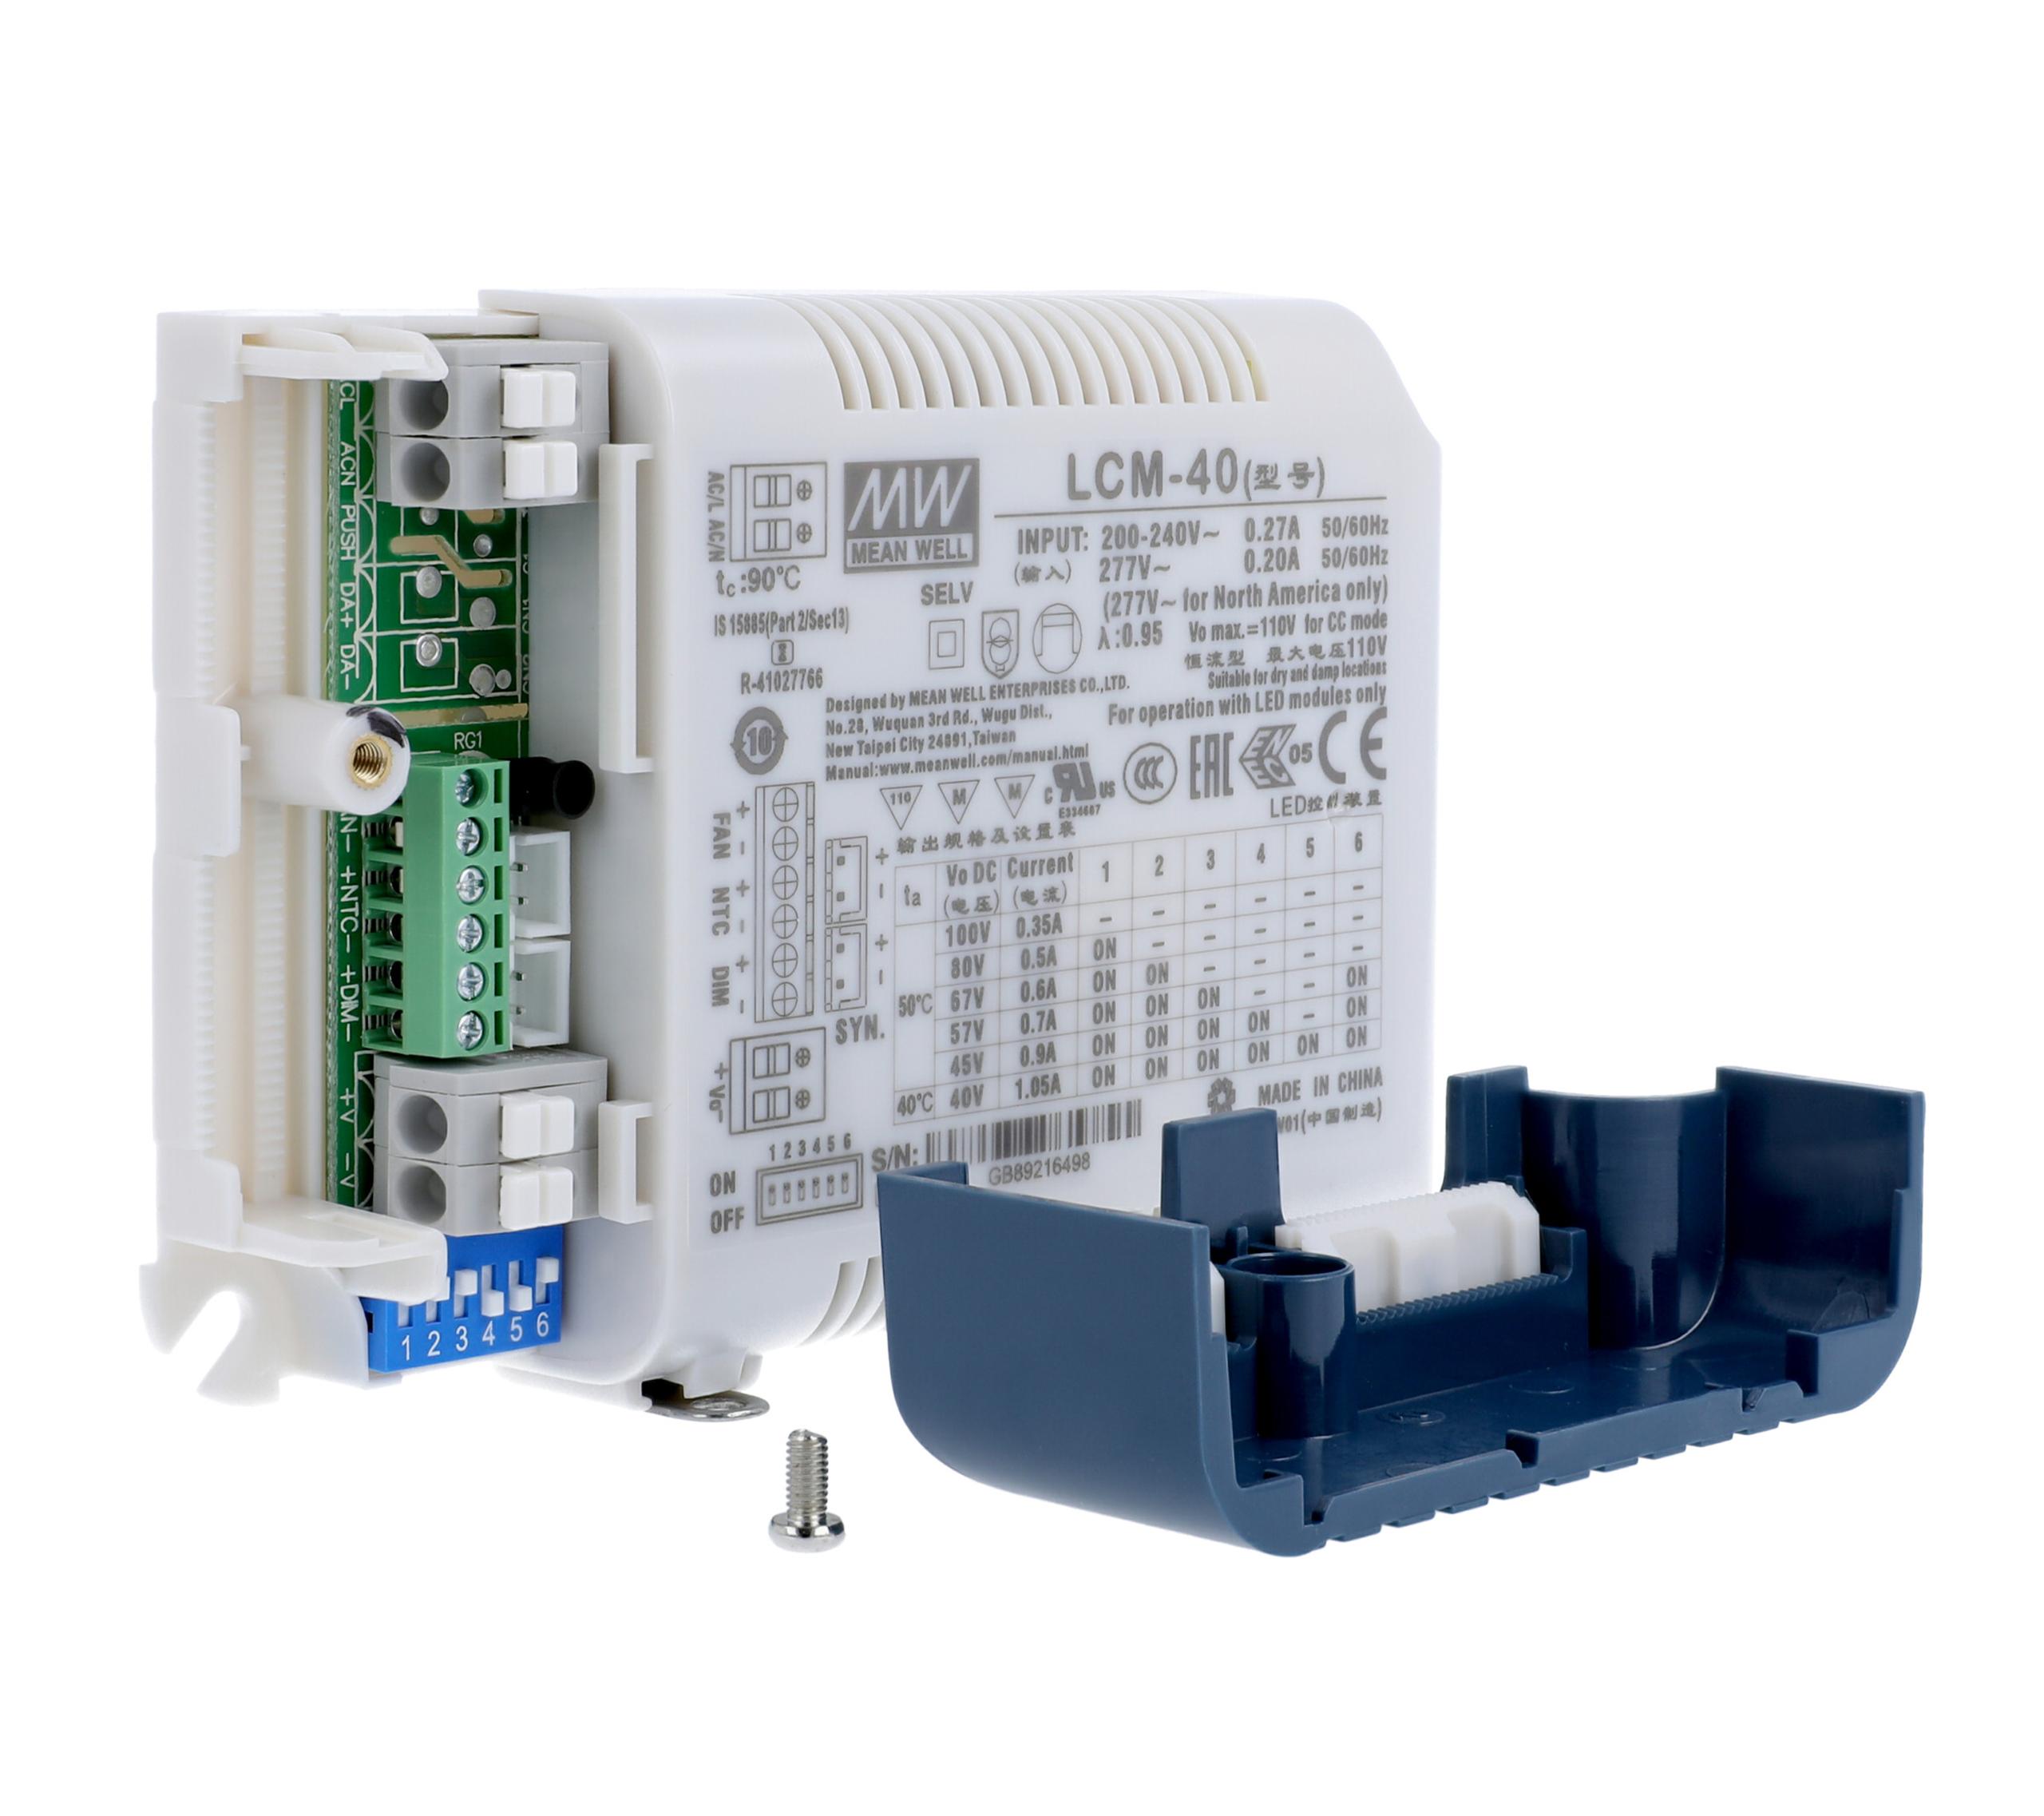 MeanWell LCM-40 LED-Schaltnetzteil